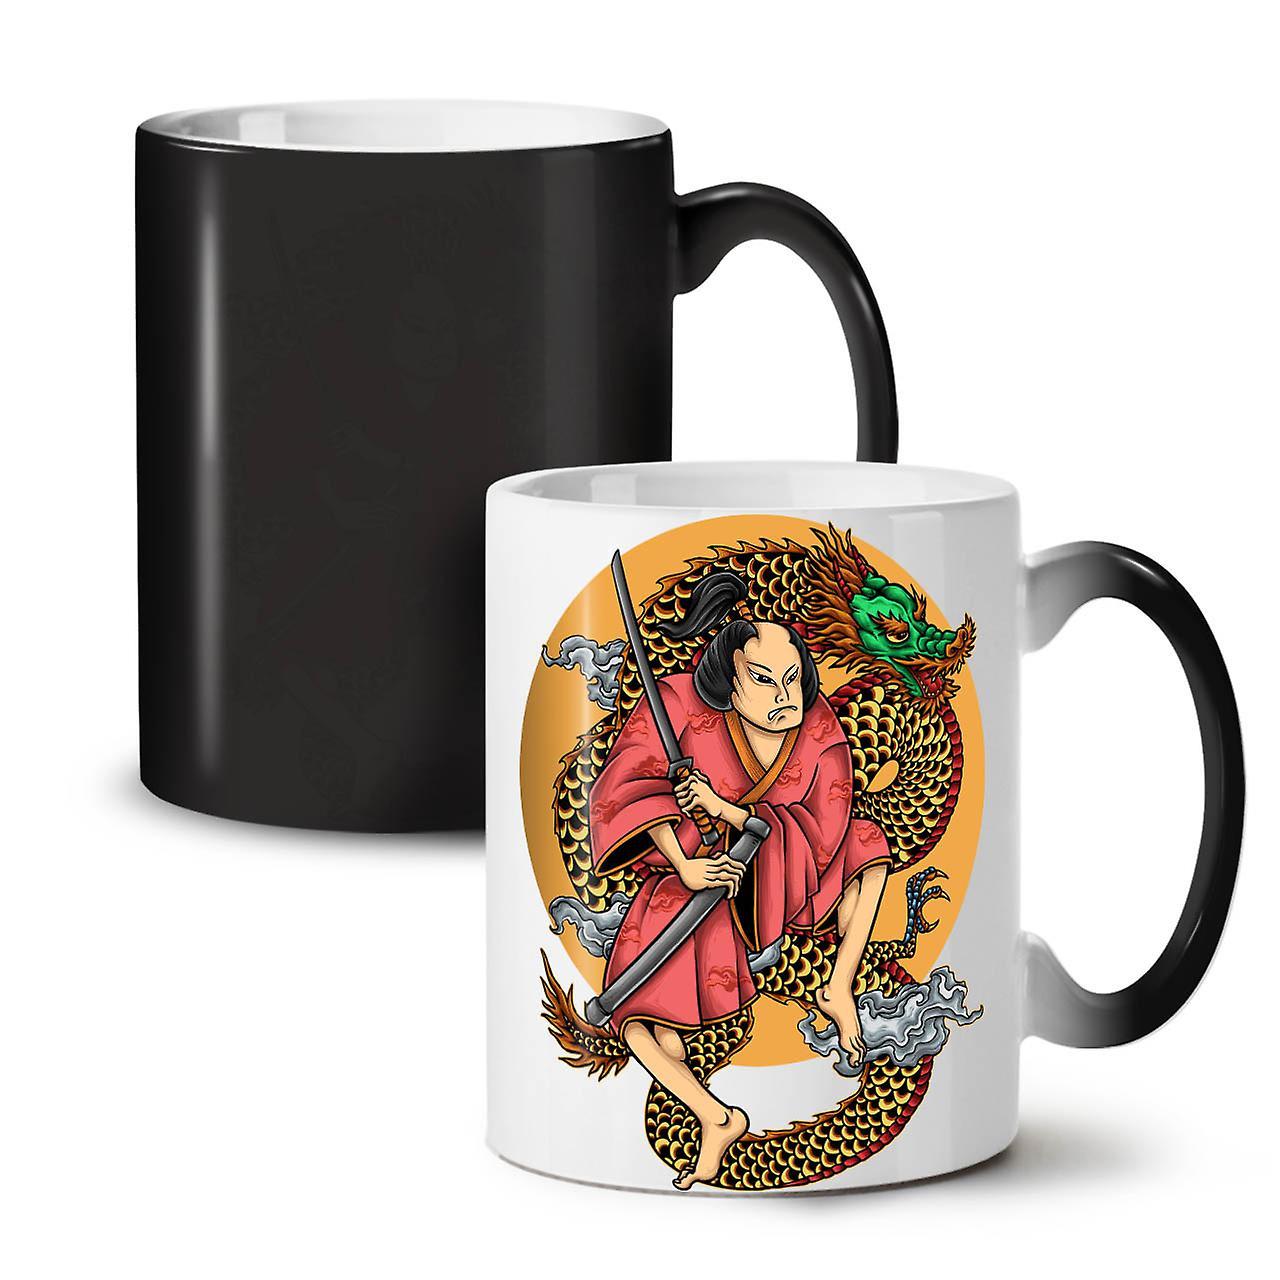 Tea Dragon 11 Ceramic Mug Art Changing Colour New Sword OzWellcoda Coffee Black 5A4jL3R